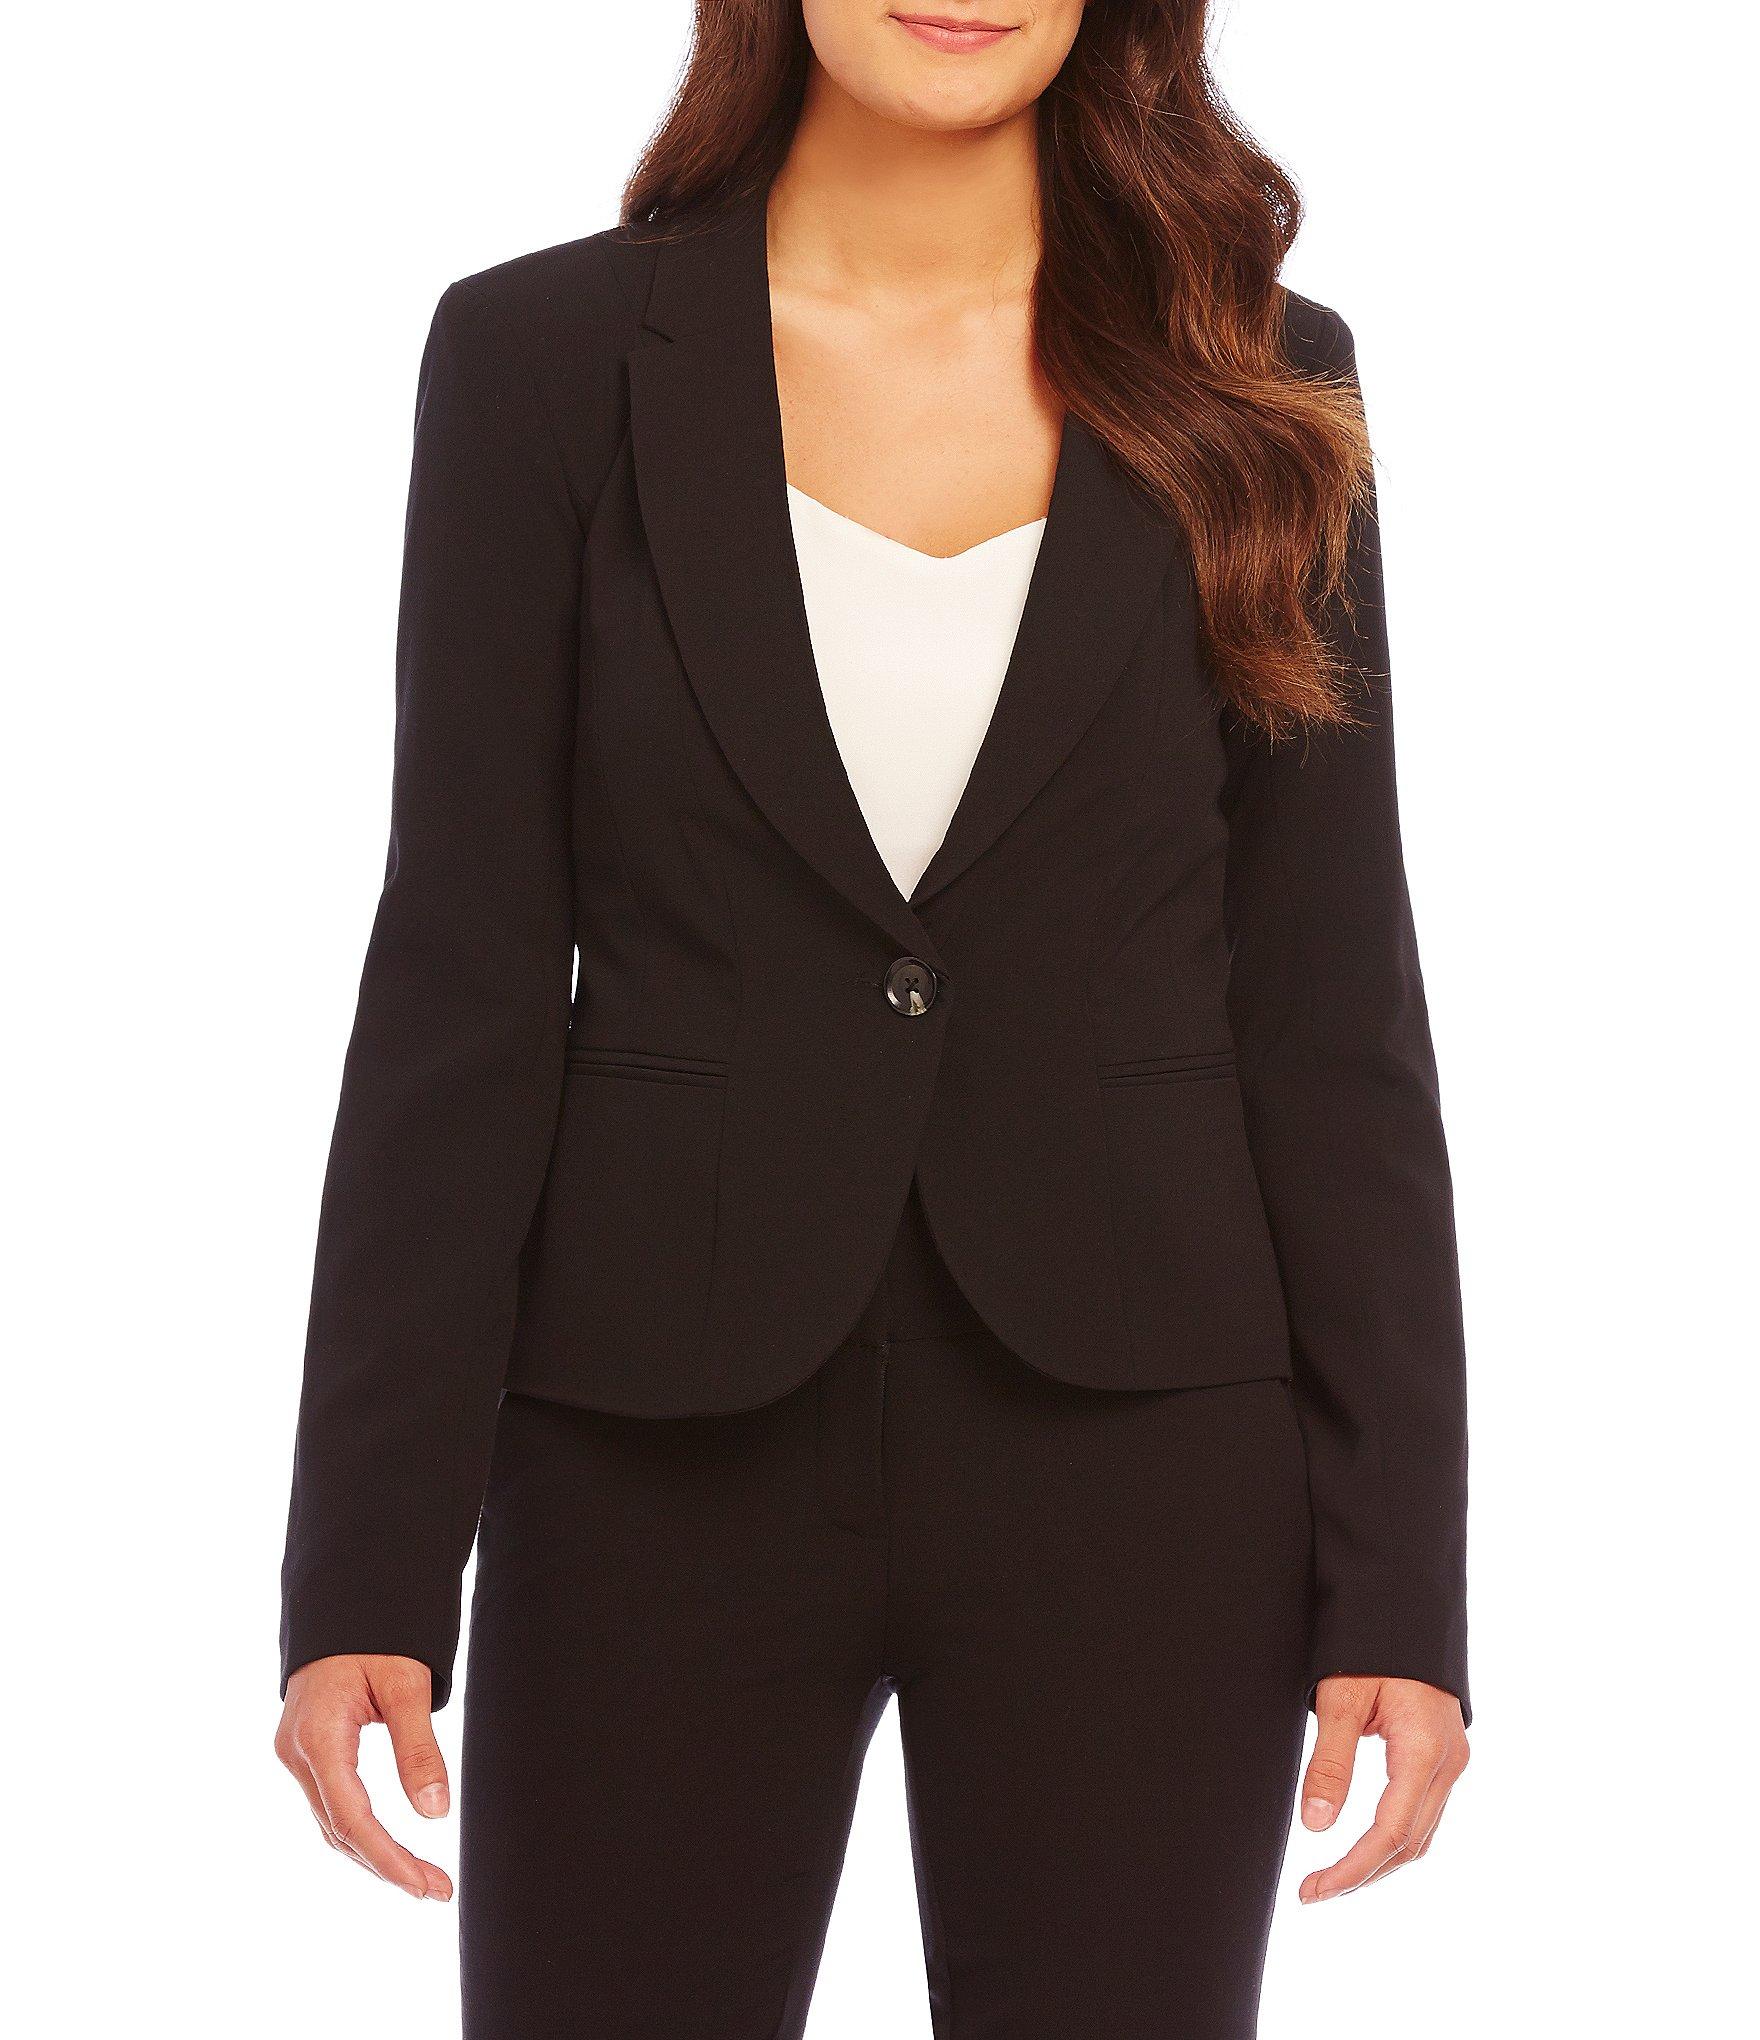 Juniors Suits Dillard S